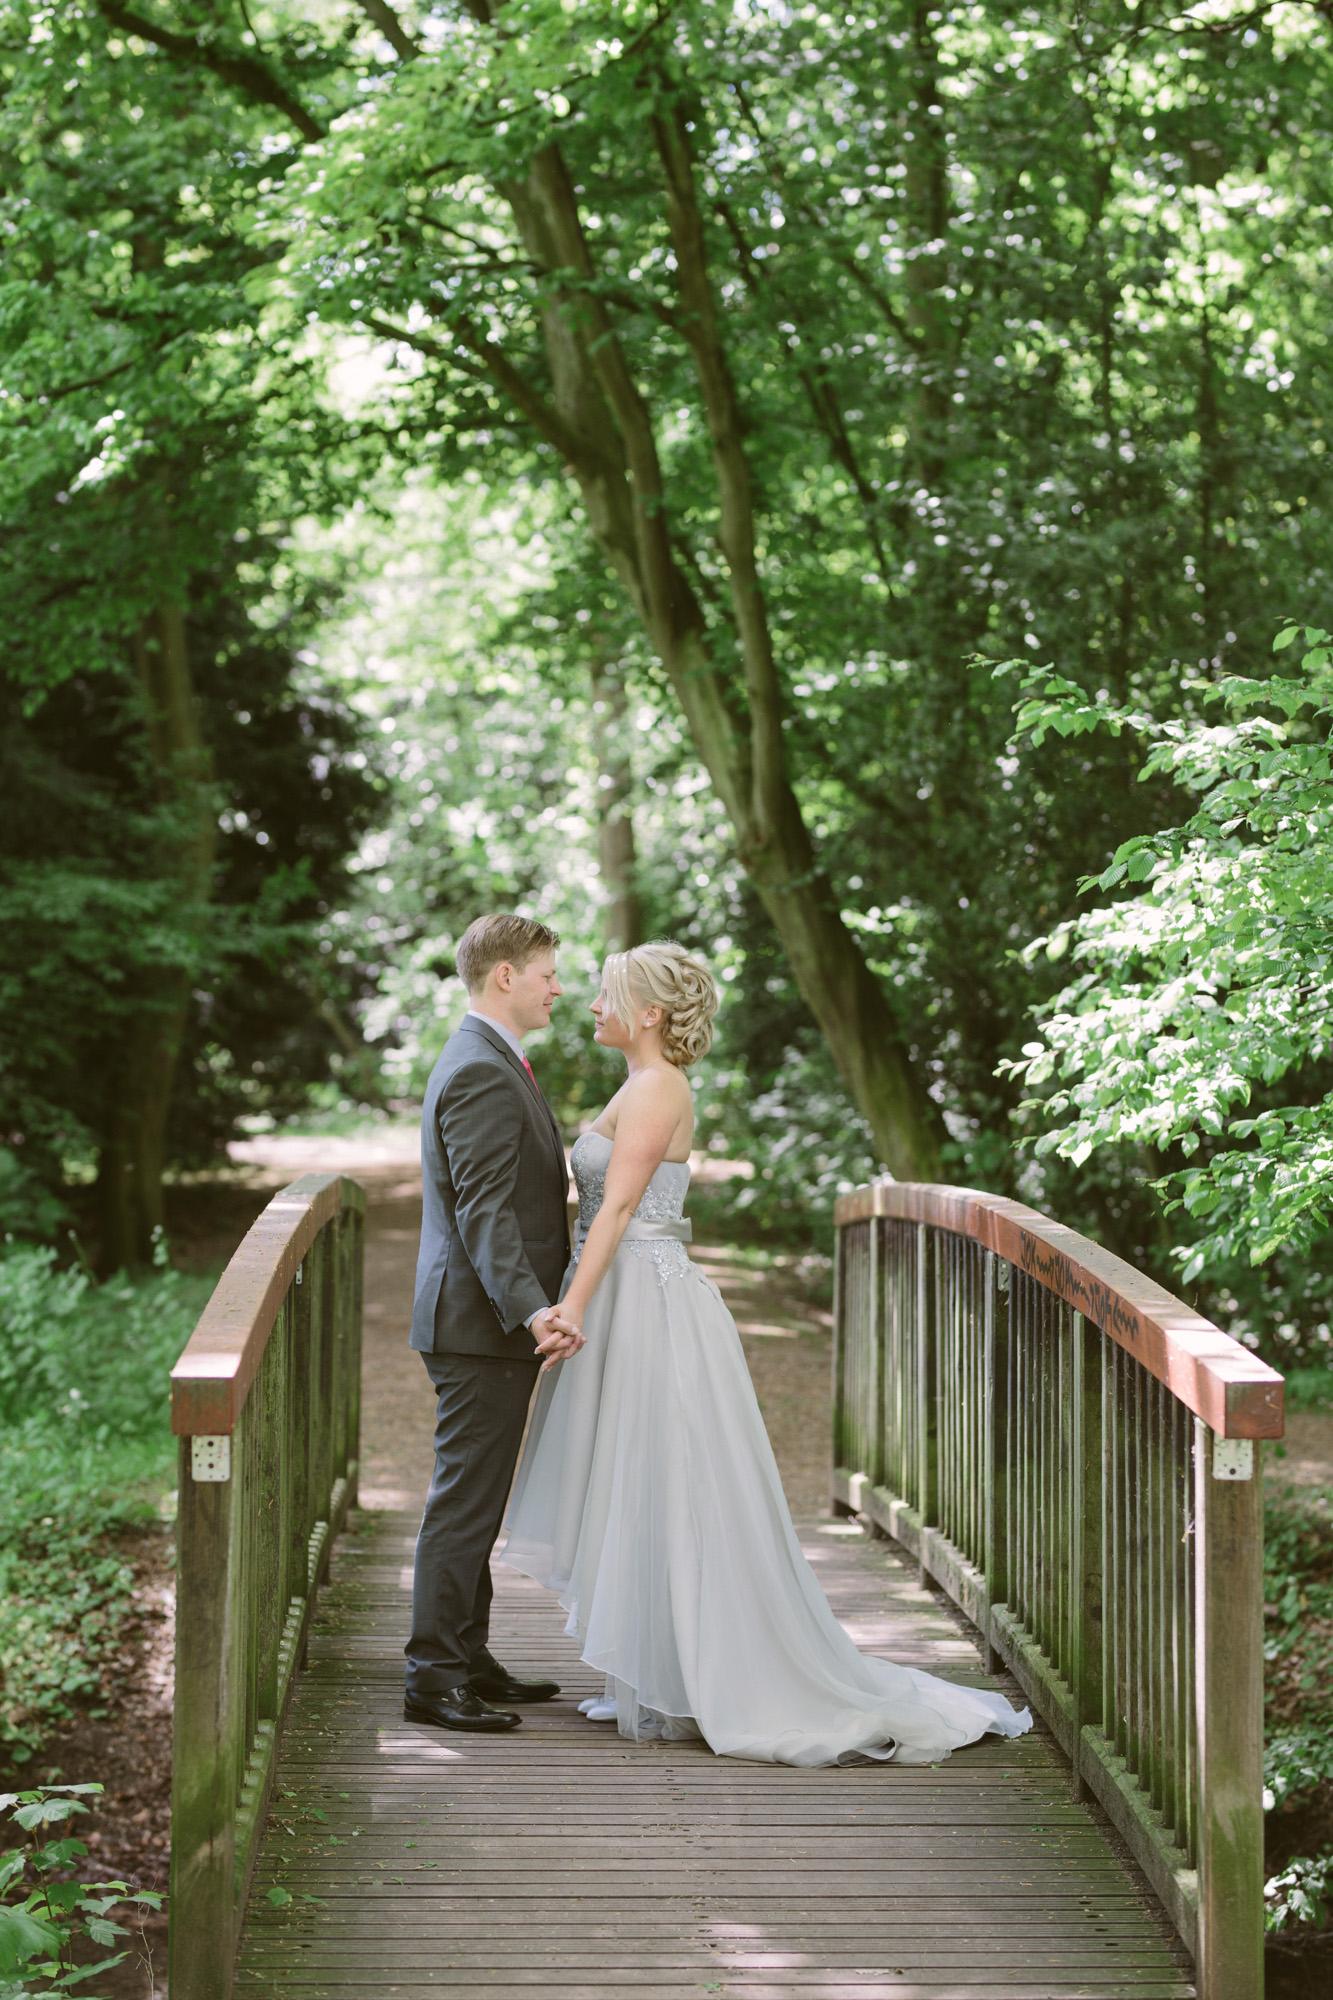 Claudia-Krawinkel-Hochzeitsfotografie-Essen-Duisburg-Standesamt-Schloss-Borbeck-22